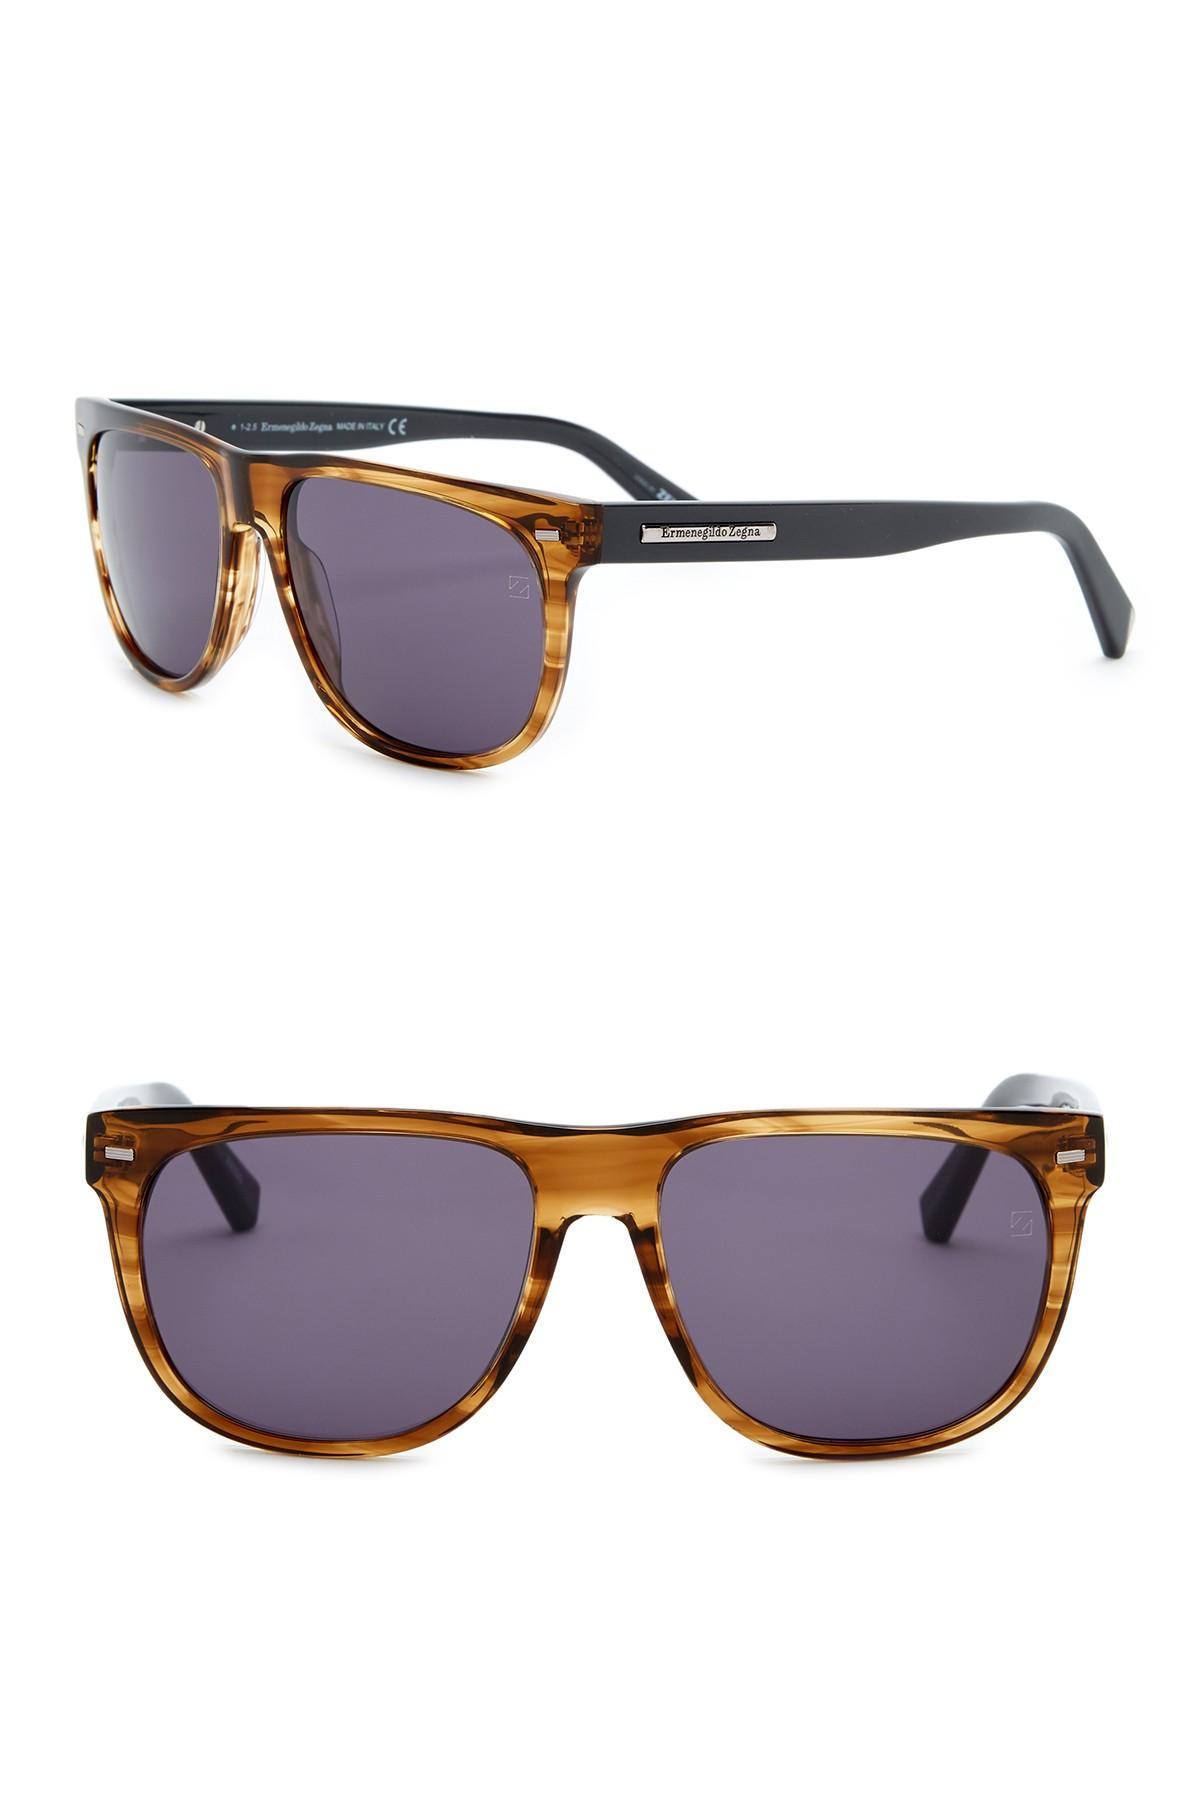 9adeff242a10 Ermenegildo Zegna - Brown Square 56mm Acetate Frame Sunglasses for Men -  Lyst. View fullscreen